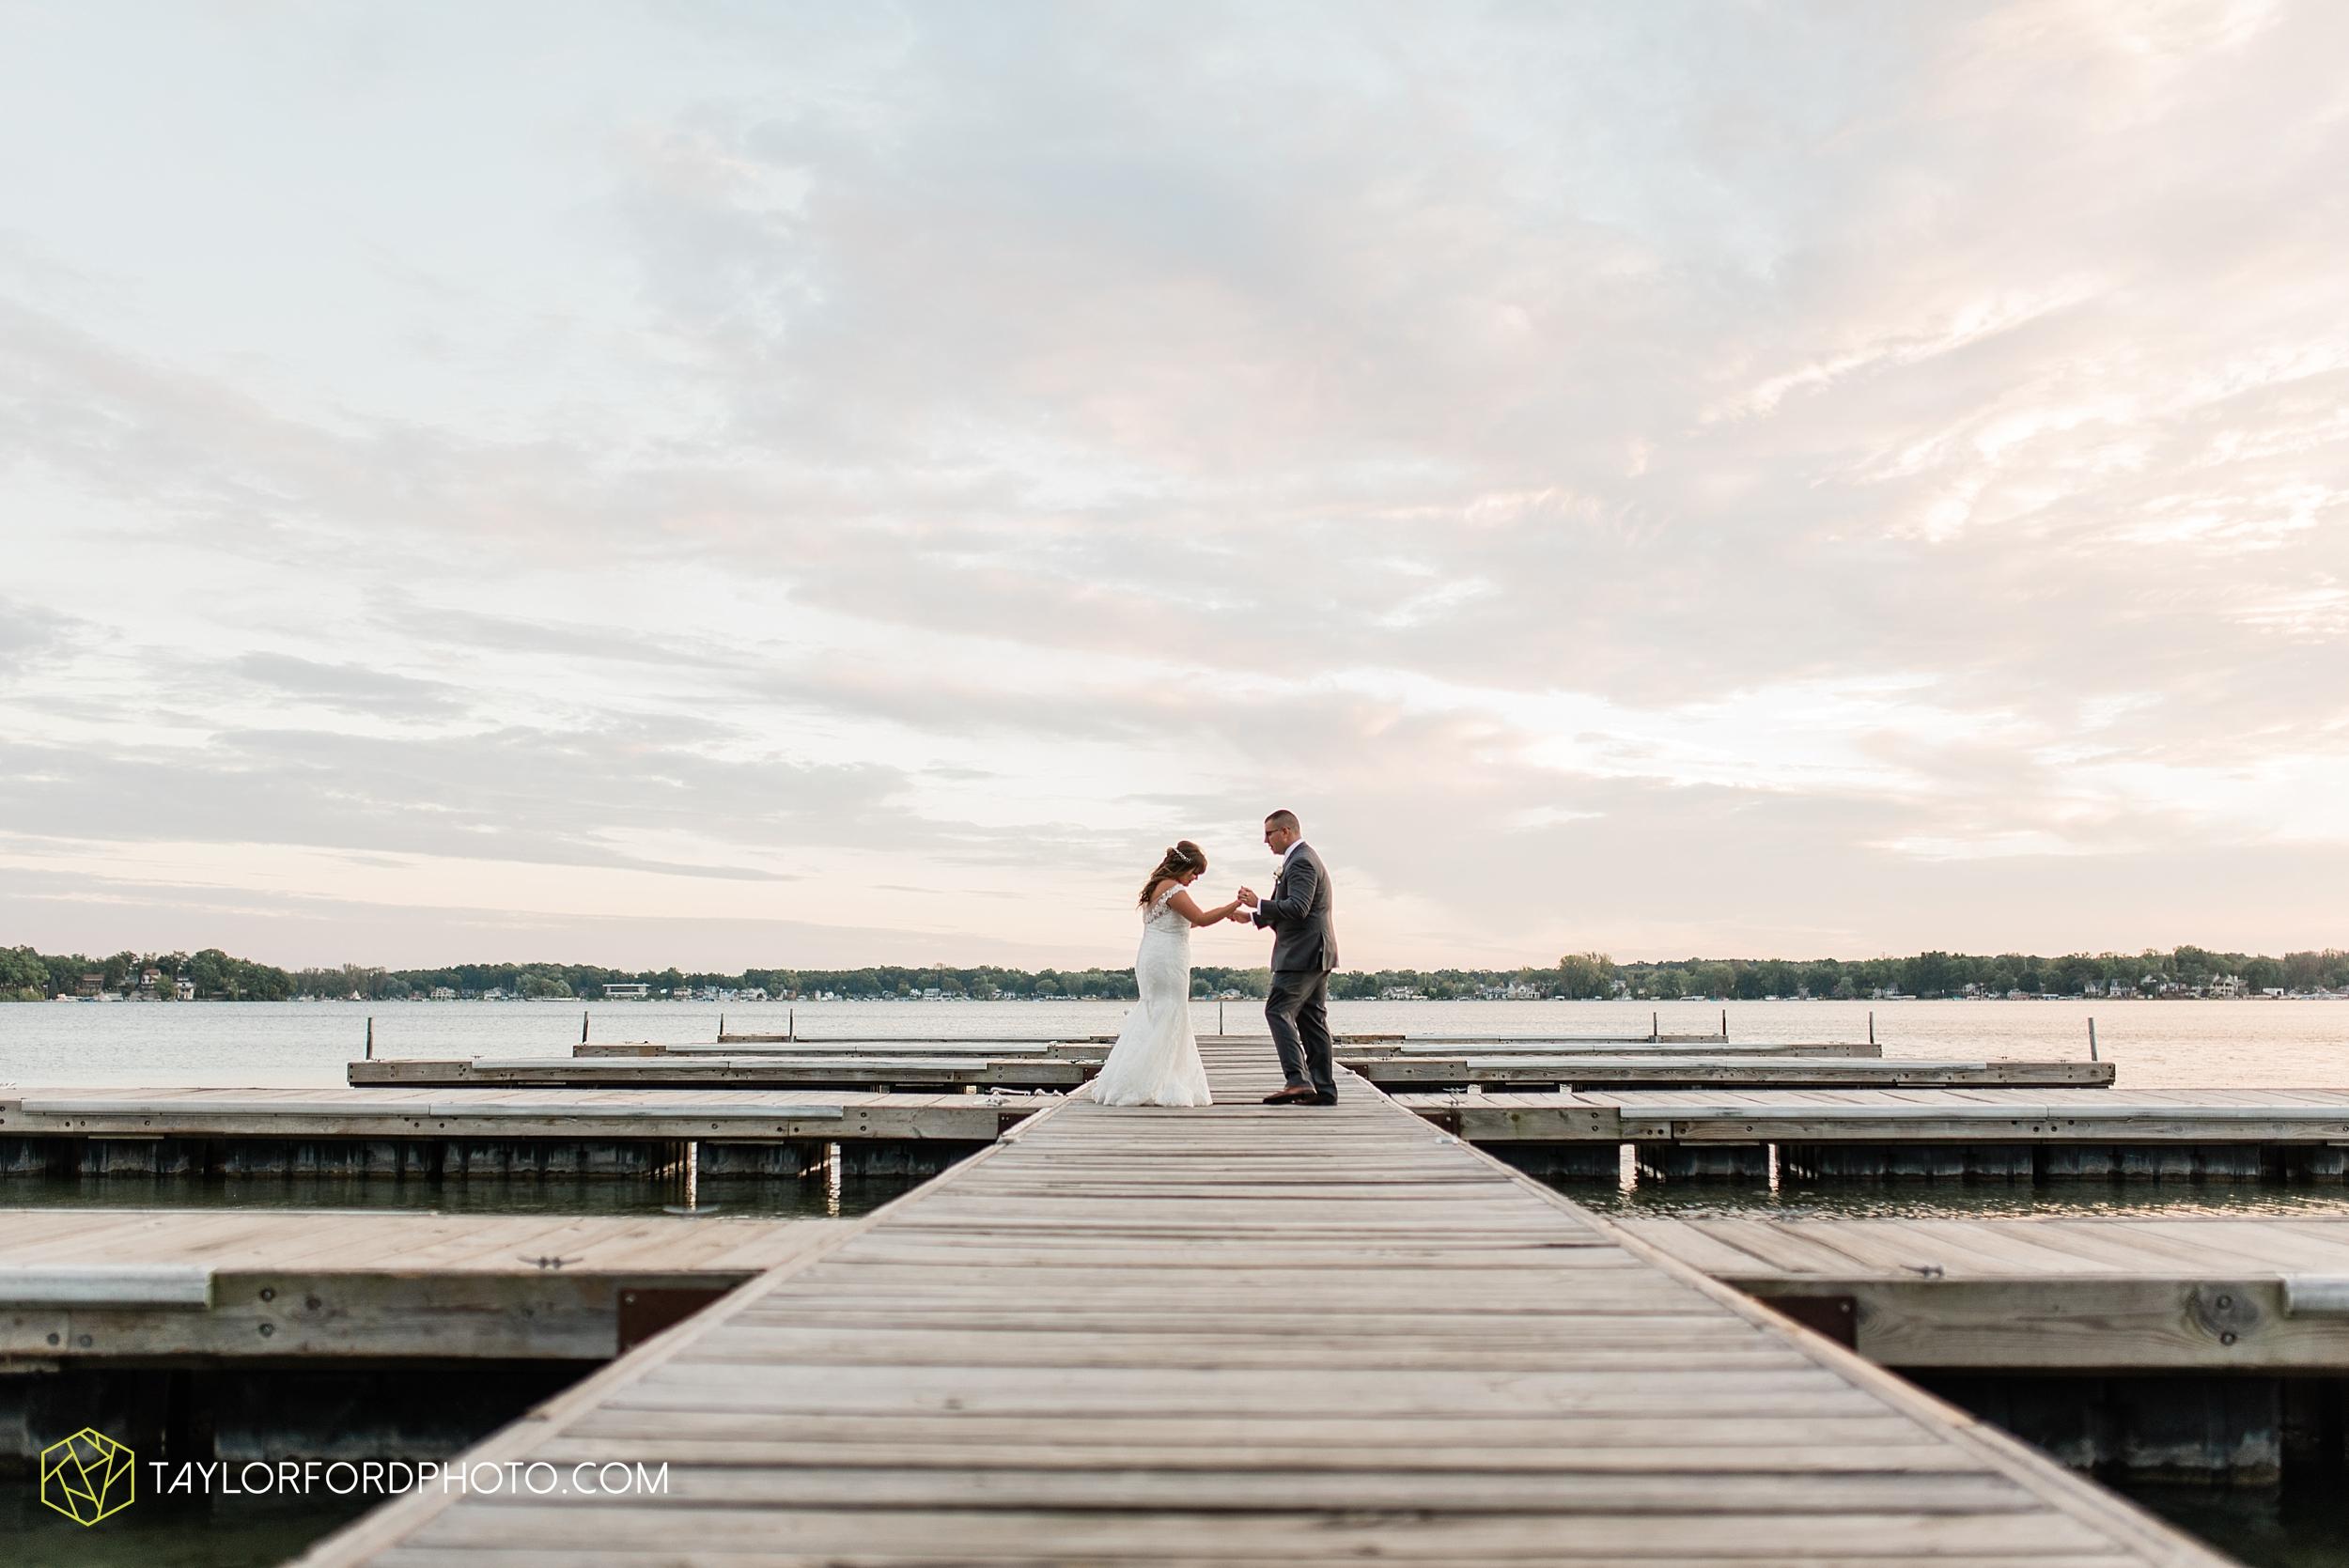 brook-loren-pokagon-state-park-angola-indiana-potowatomi-inn-wedding-fall-lake-james-photographer-taylor-ford-photography_0566.jpg